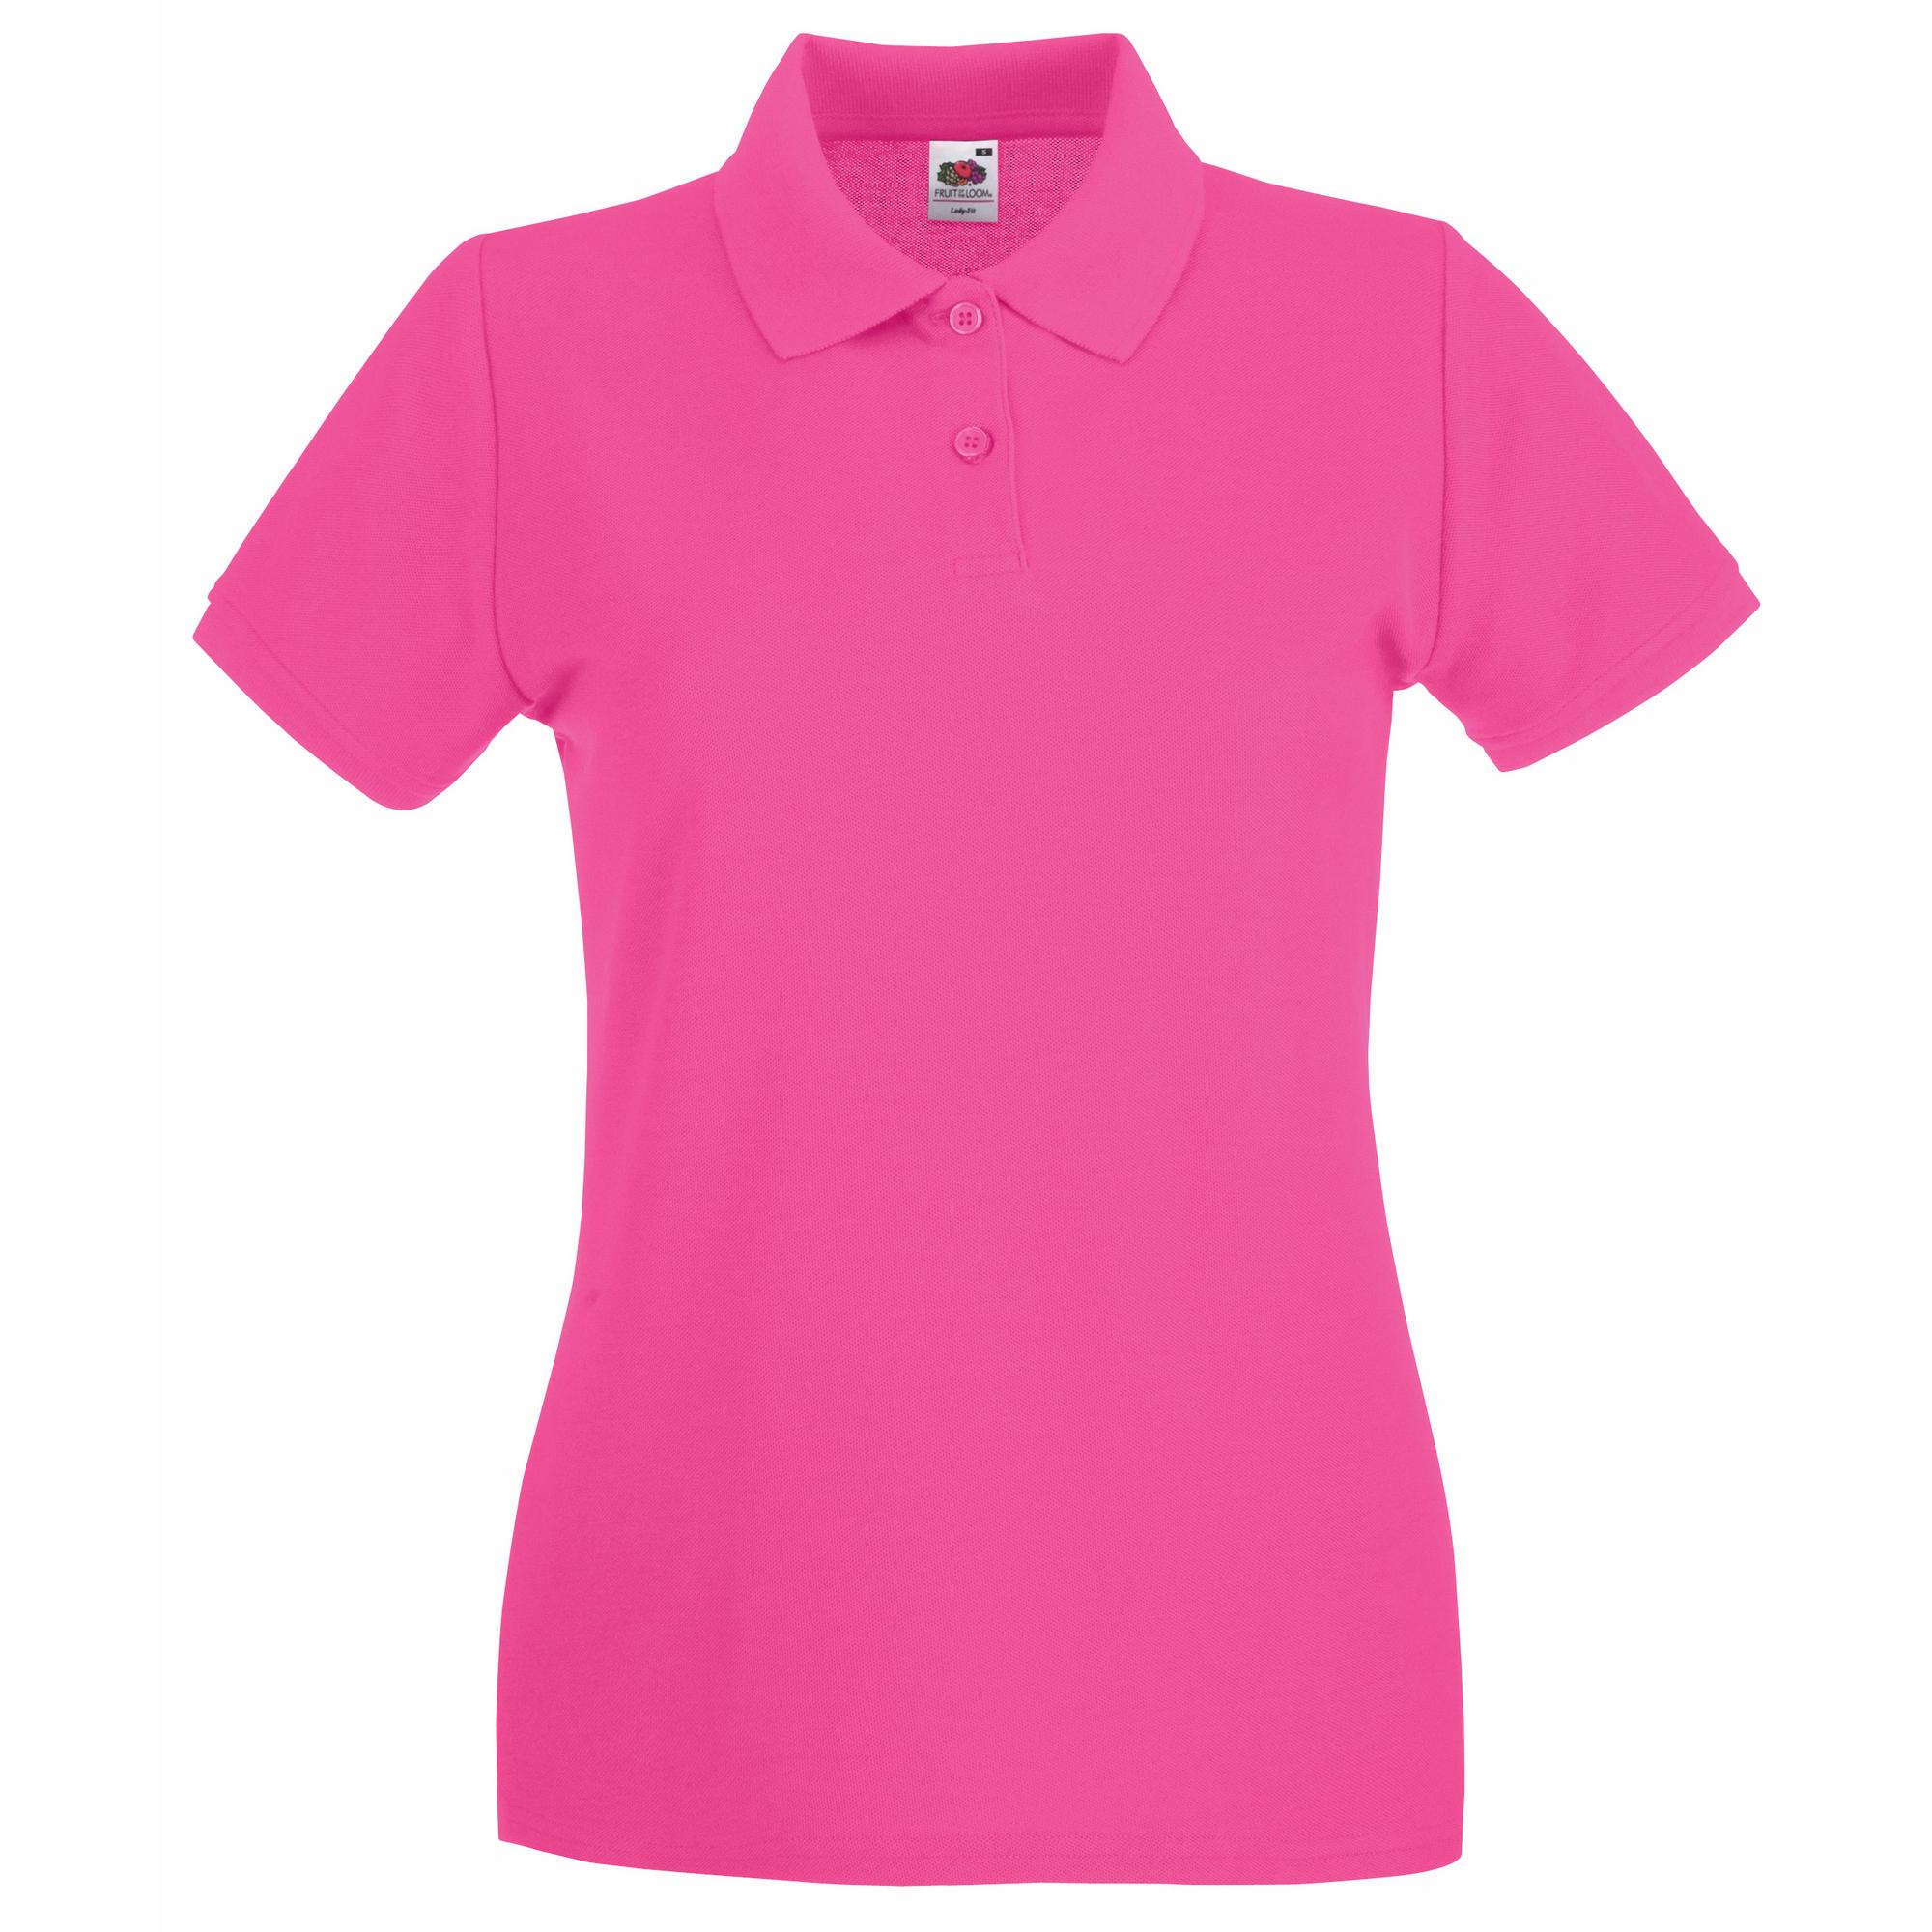 Fruit Of The Loom Ladies Lady-Fit Premium Short Sleeve Polo Shirt (S) (Fuchsia)